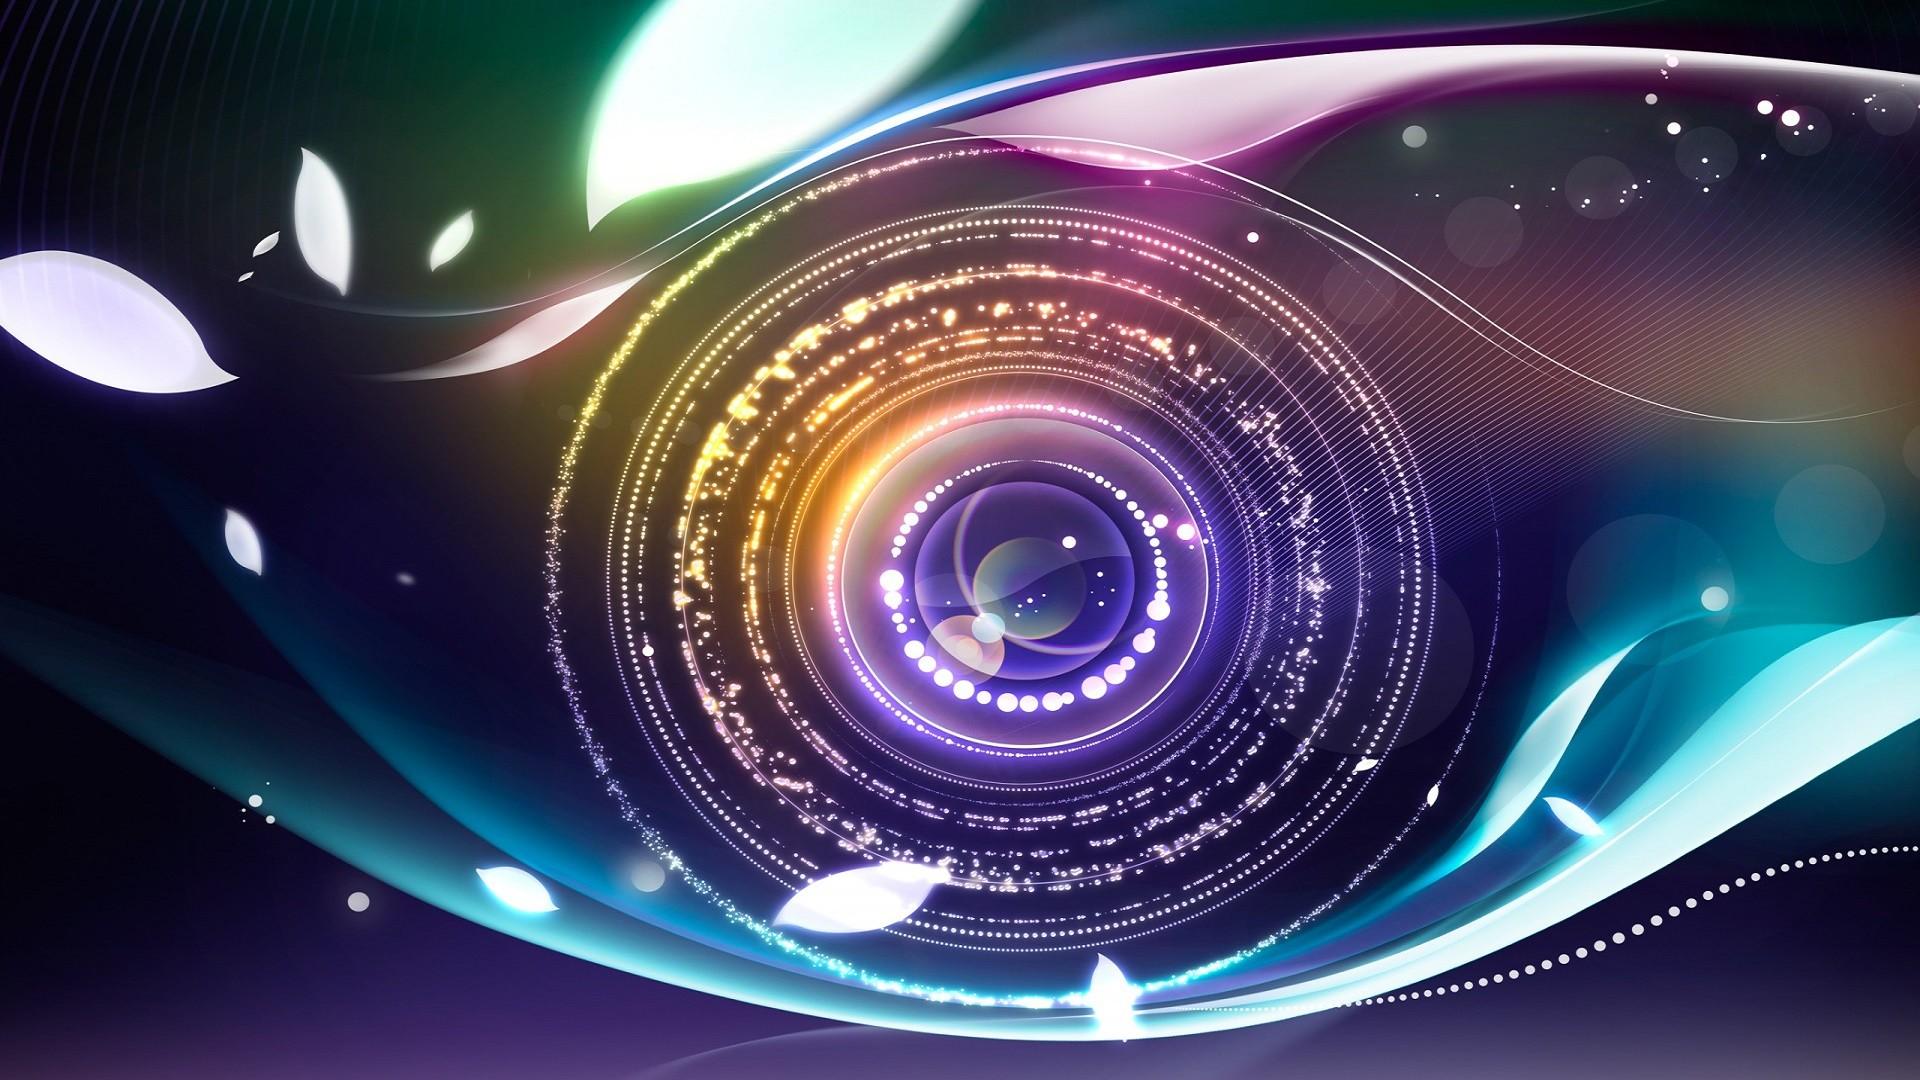 digital-abstract-eye-hd-3d-wallpaper-free-download-